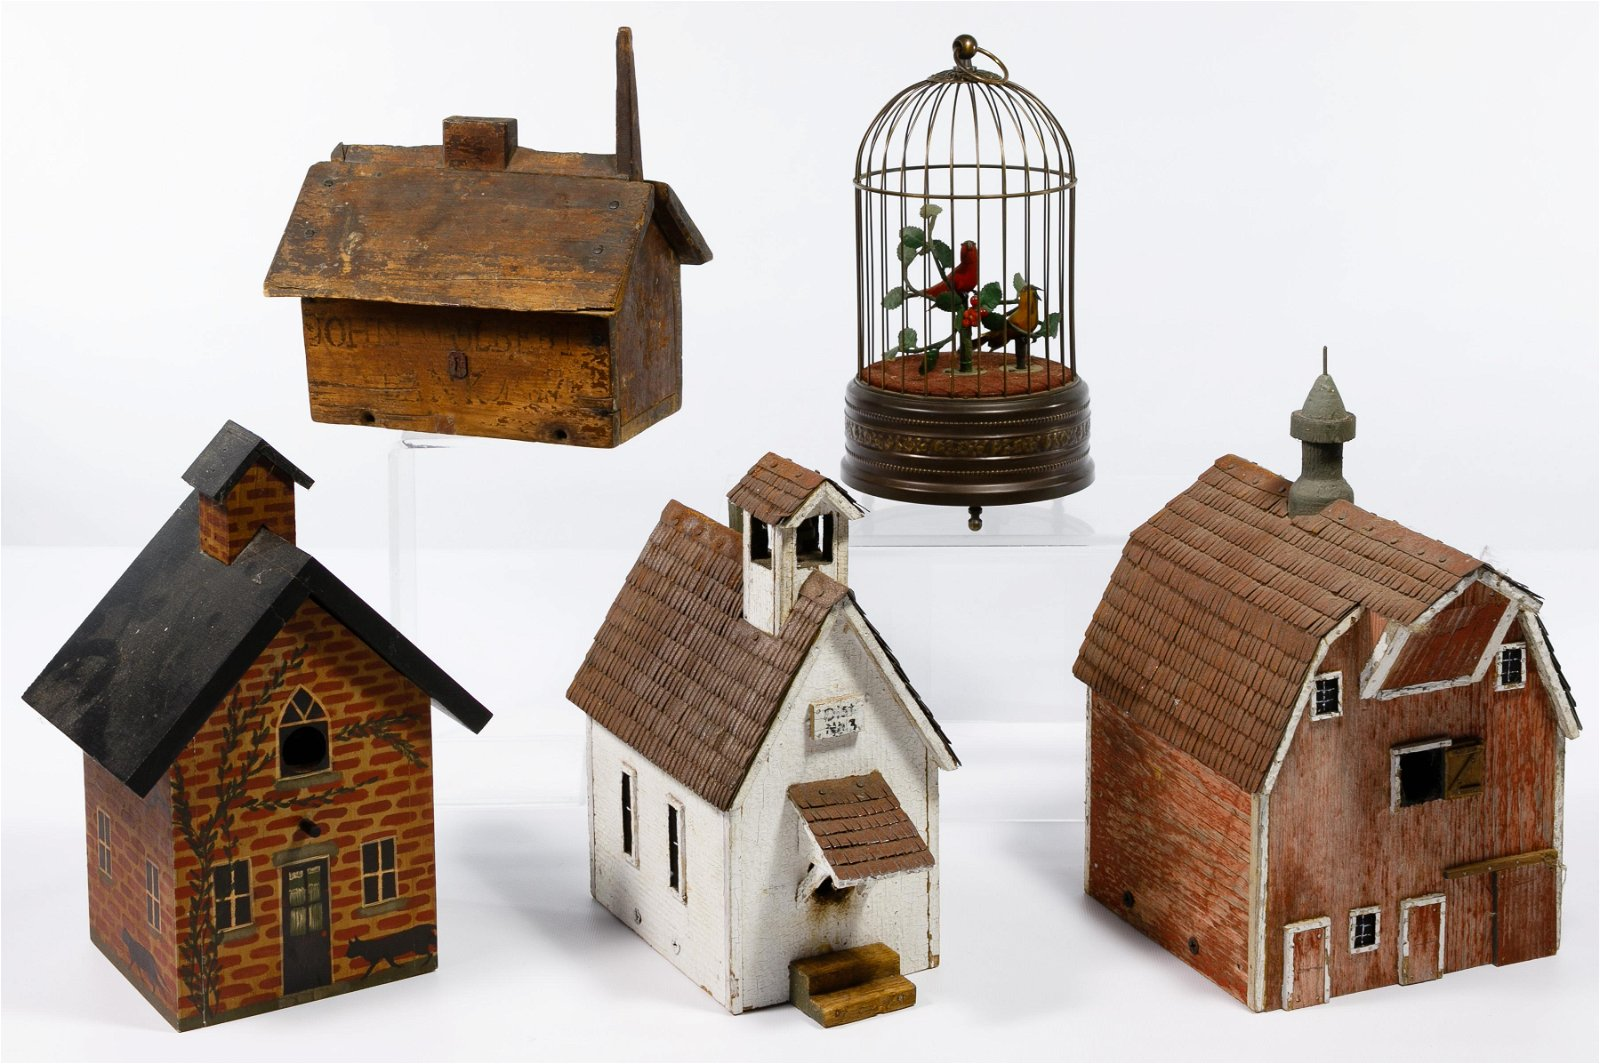 Wood Birdhouse Assortment